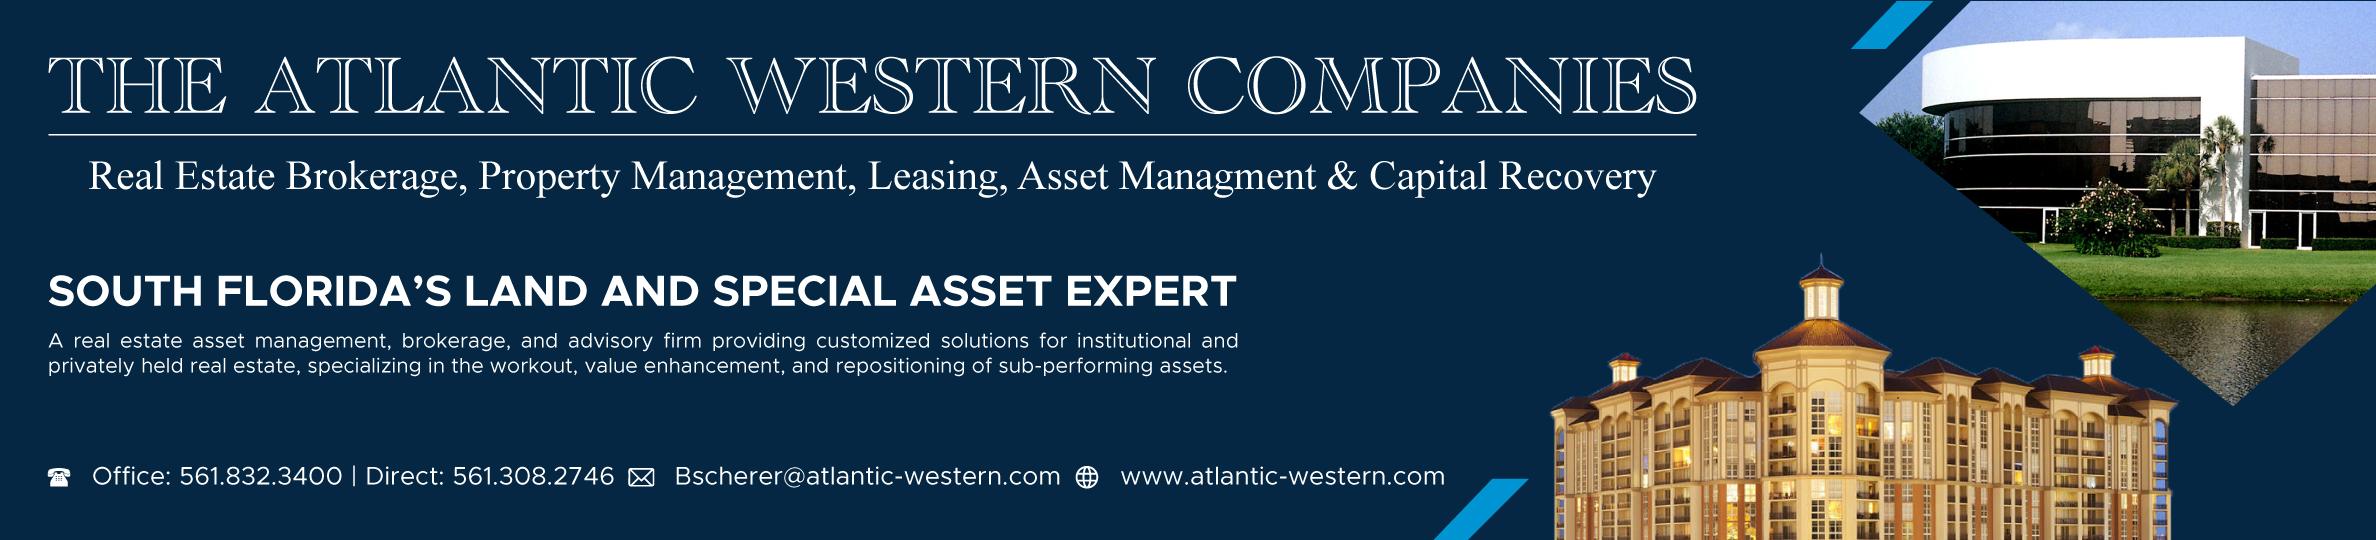 Atlantic Western Companies